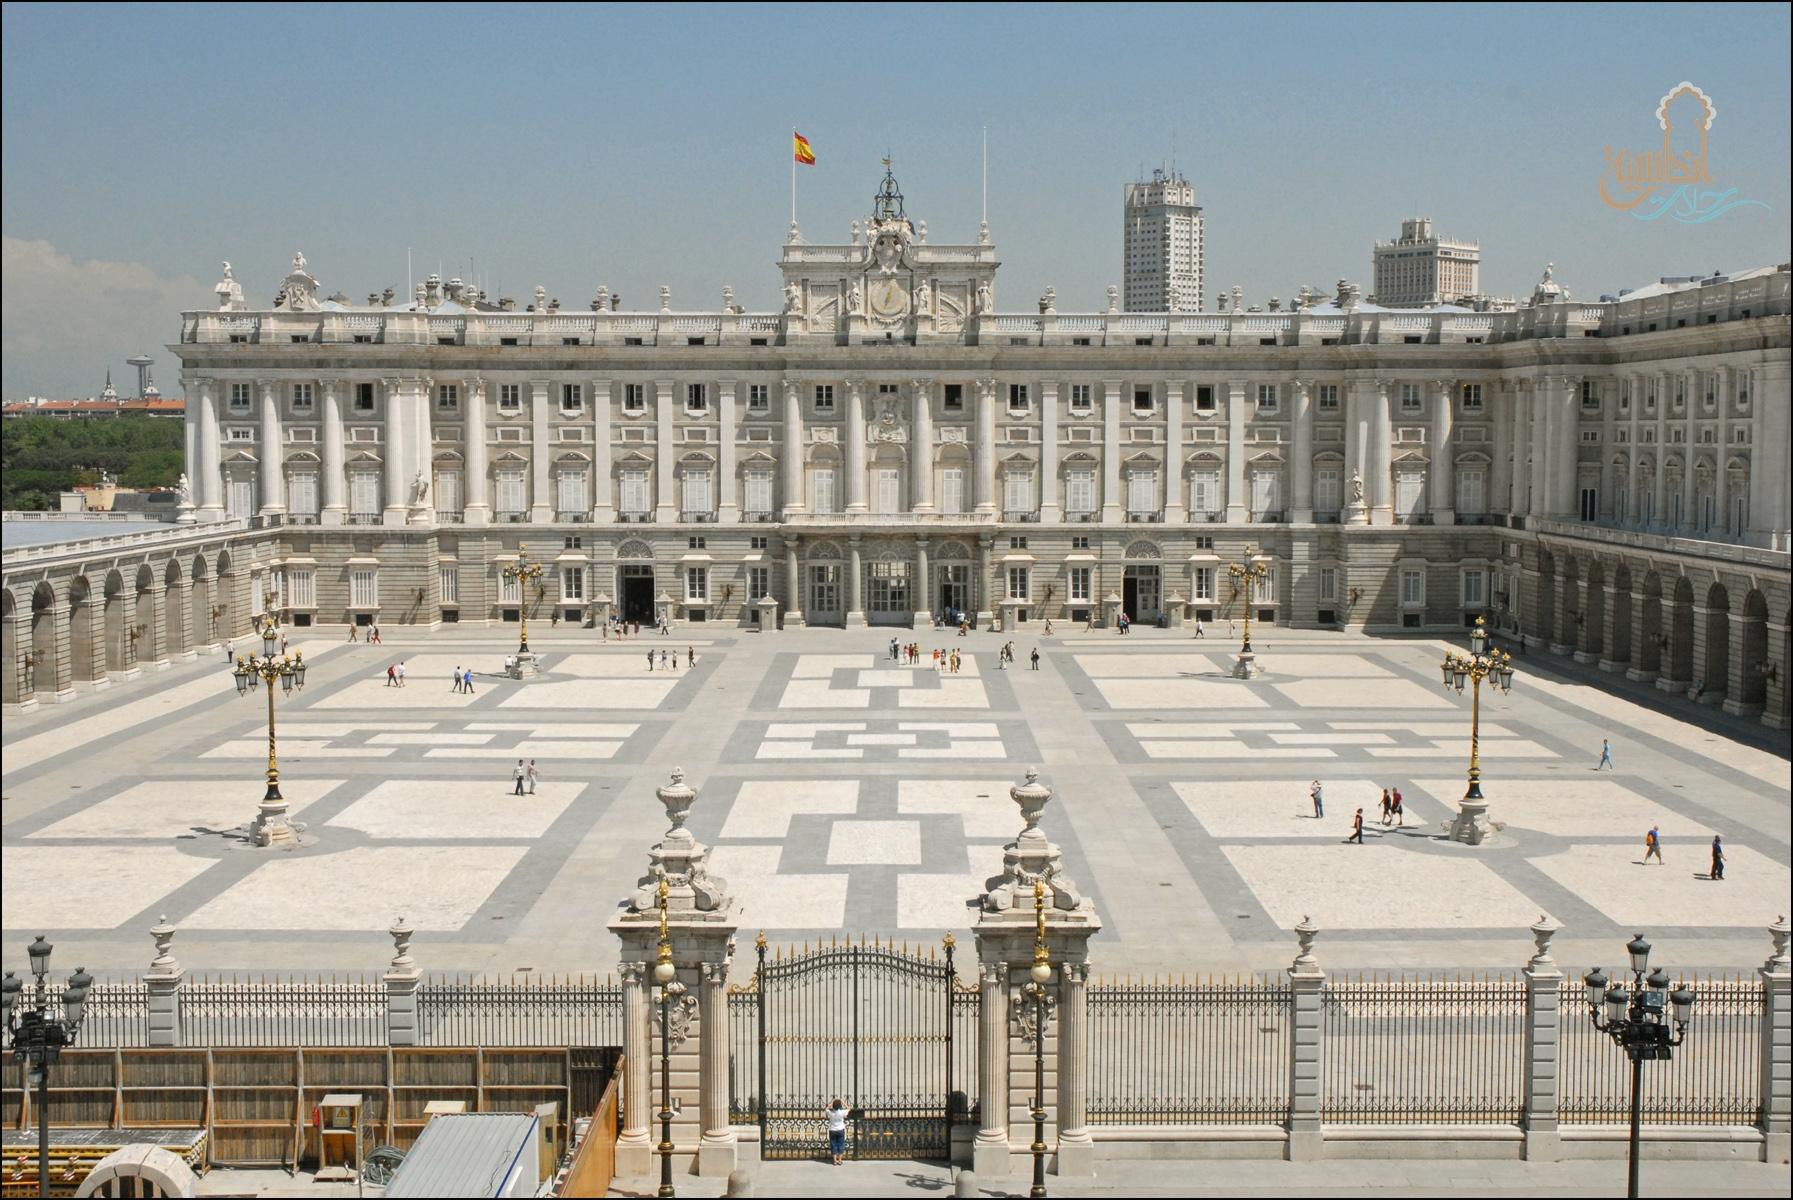 قصر مدريد الملكي Palacio Real de Madrid